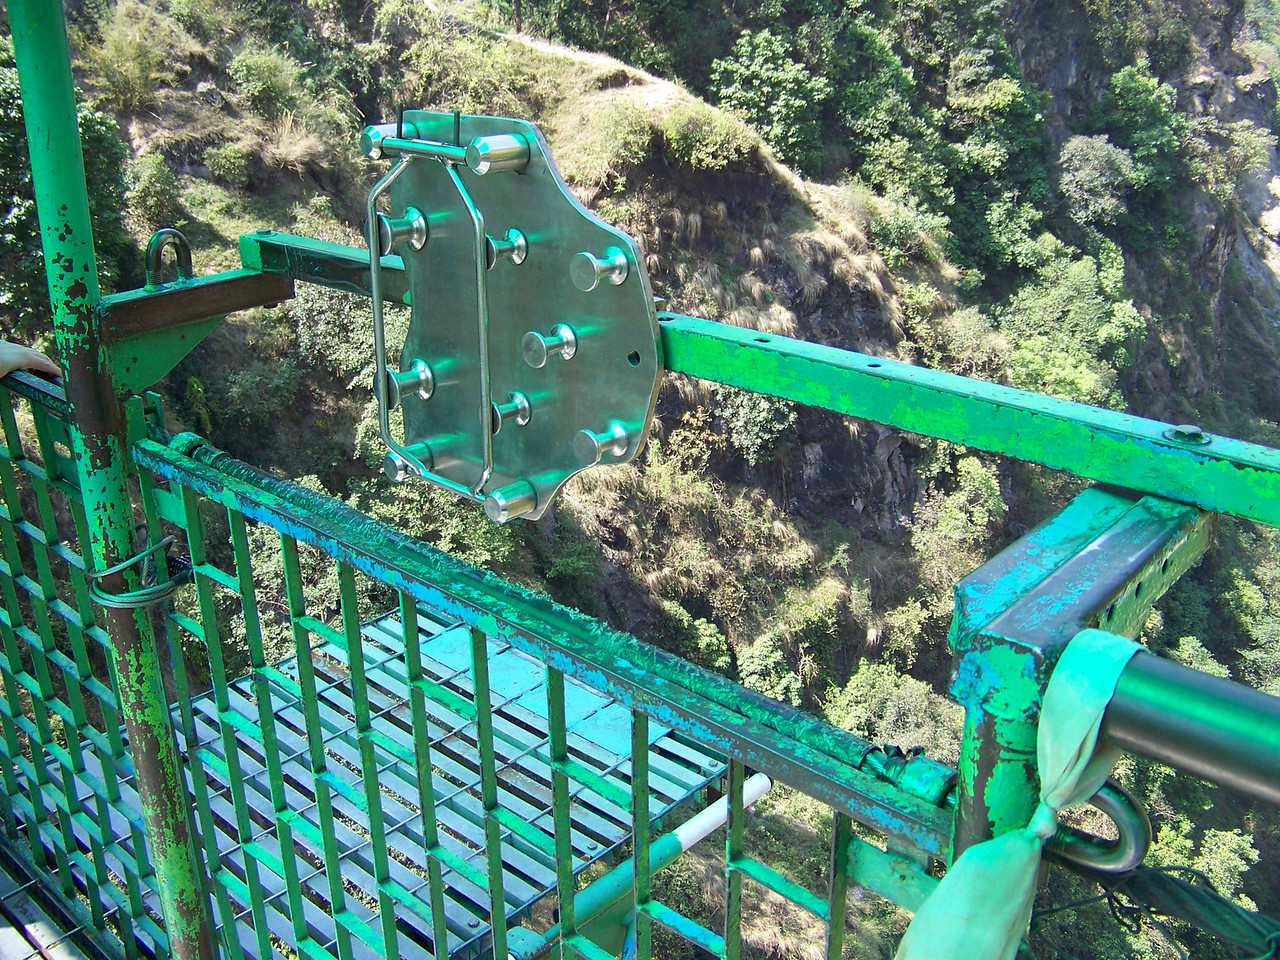 0640 - Bundgy Bridge along Araniko Highway in Nepal Between Kodari and Katmandu - Nepal.JPG